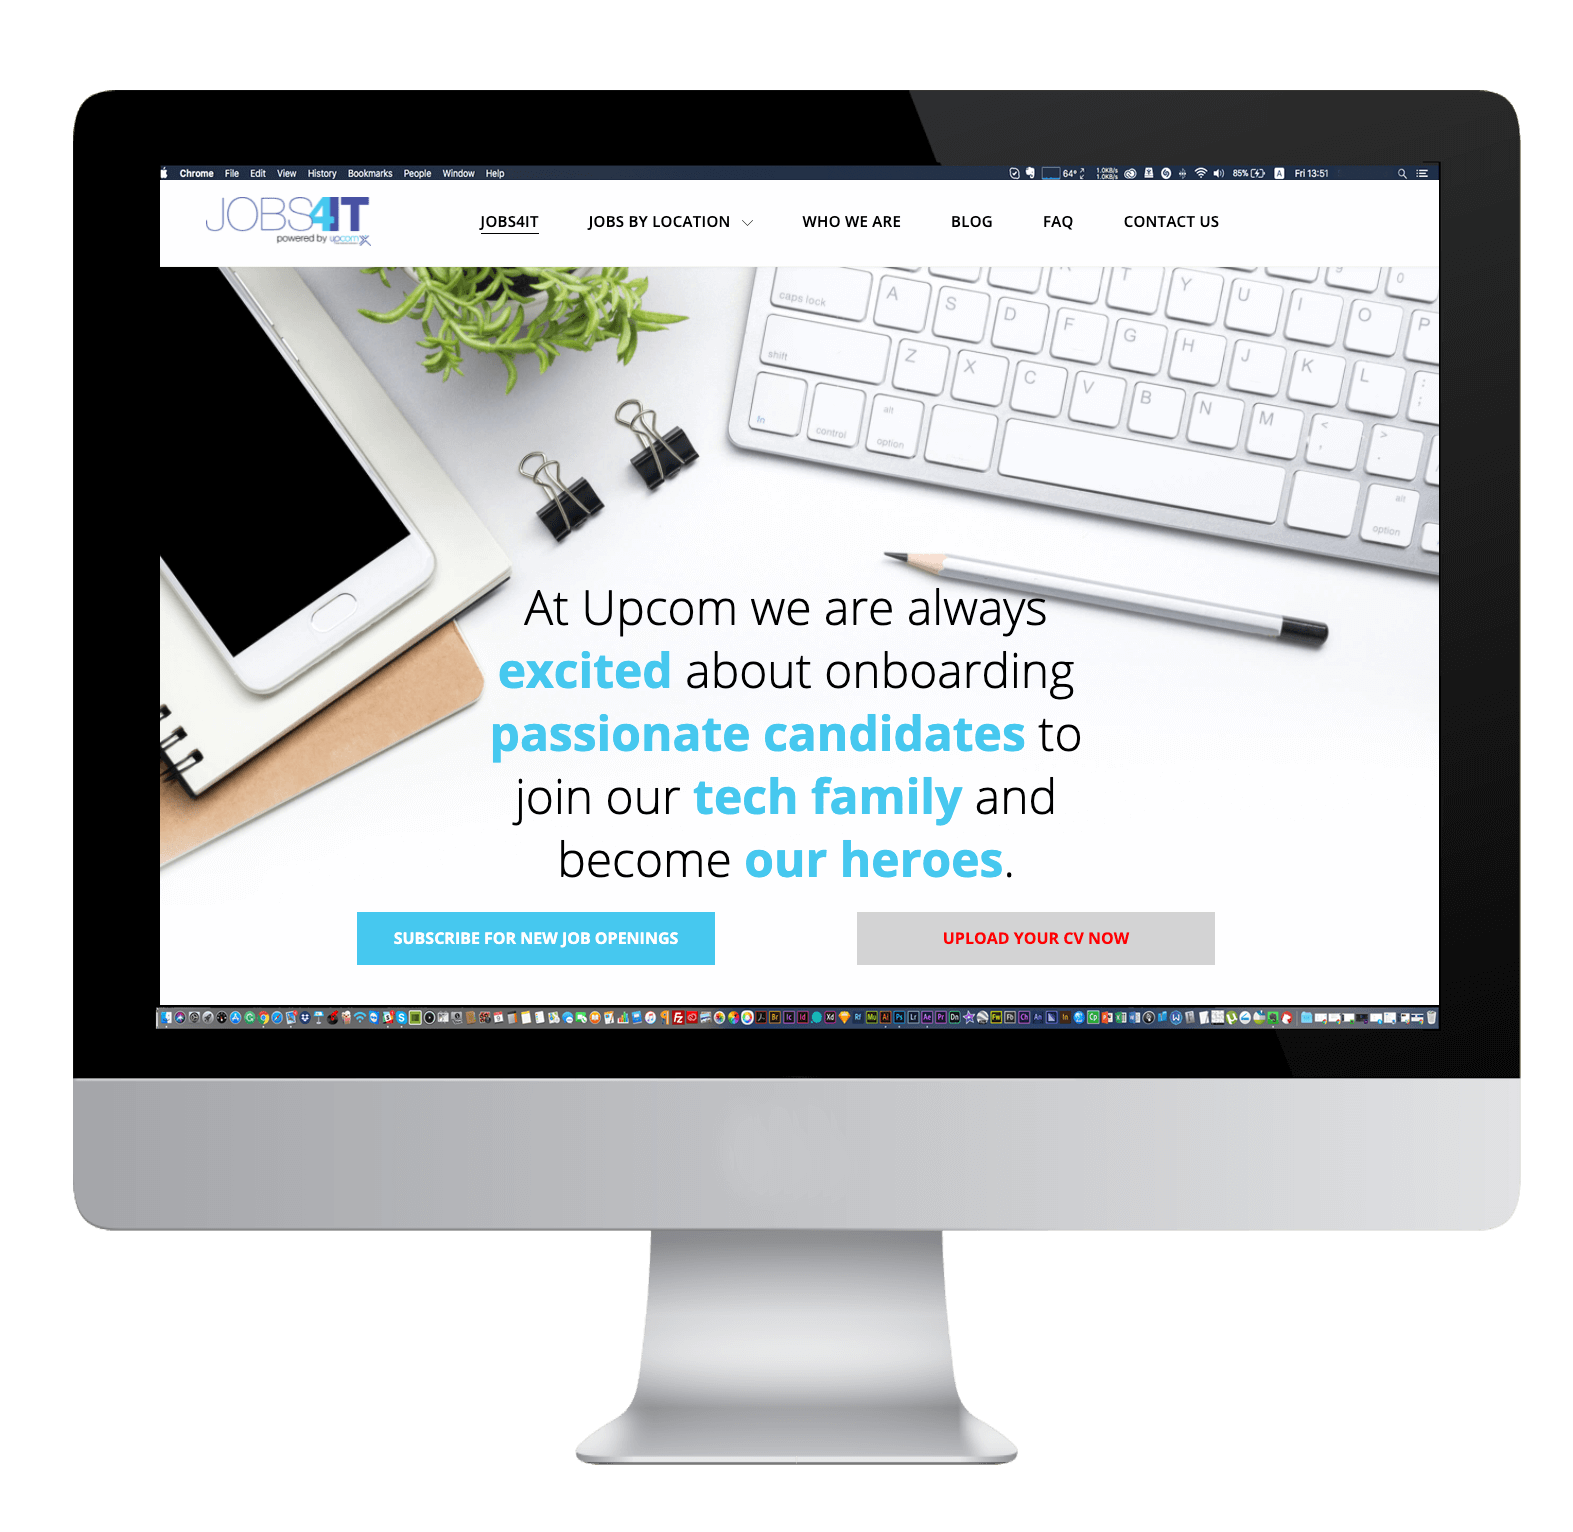 upcominds_WEBimage_Jobs4IT.png